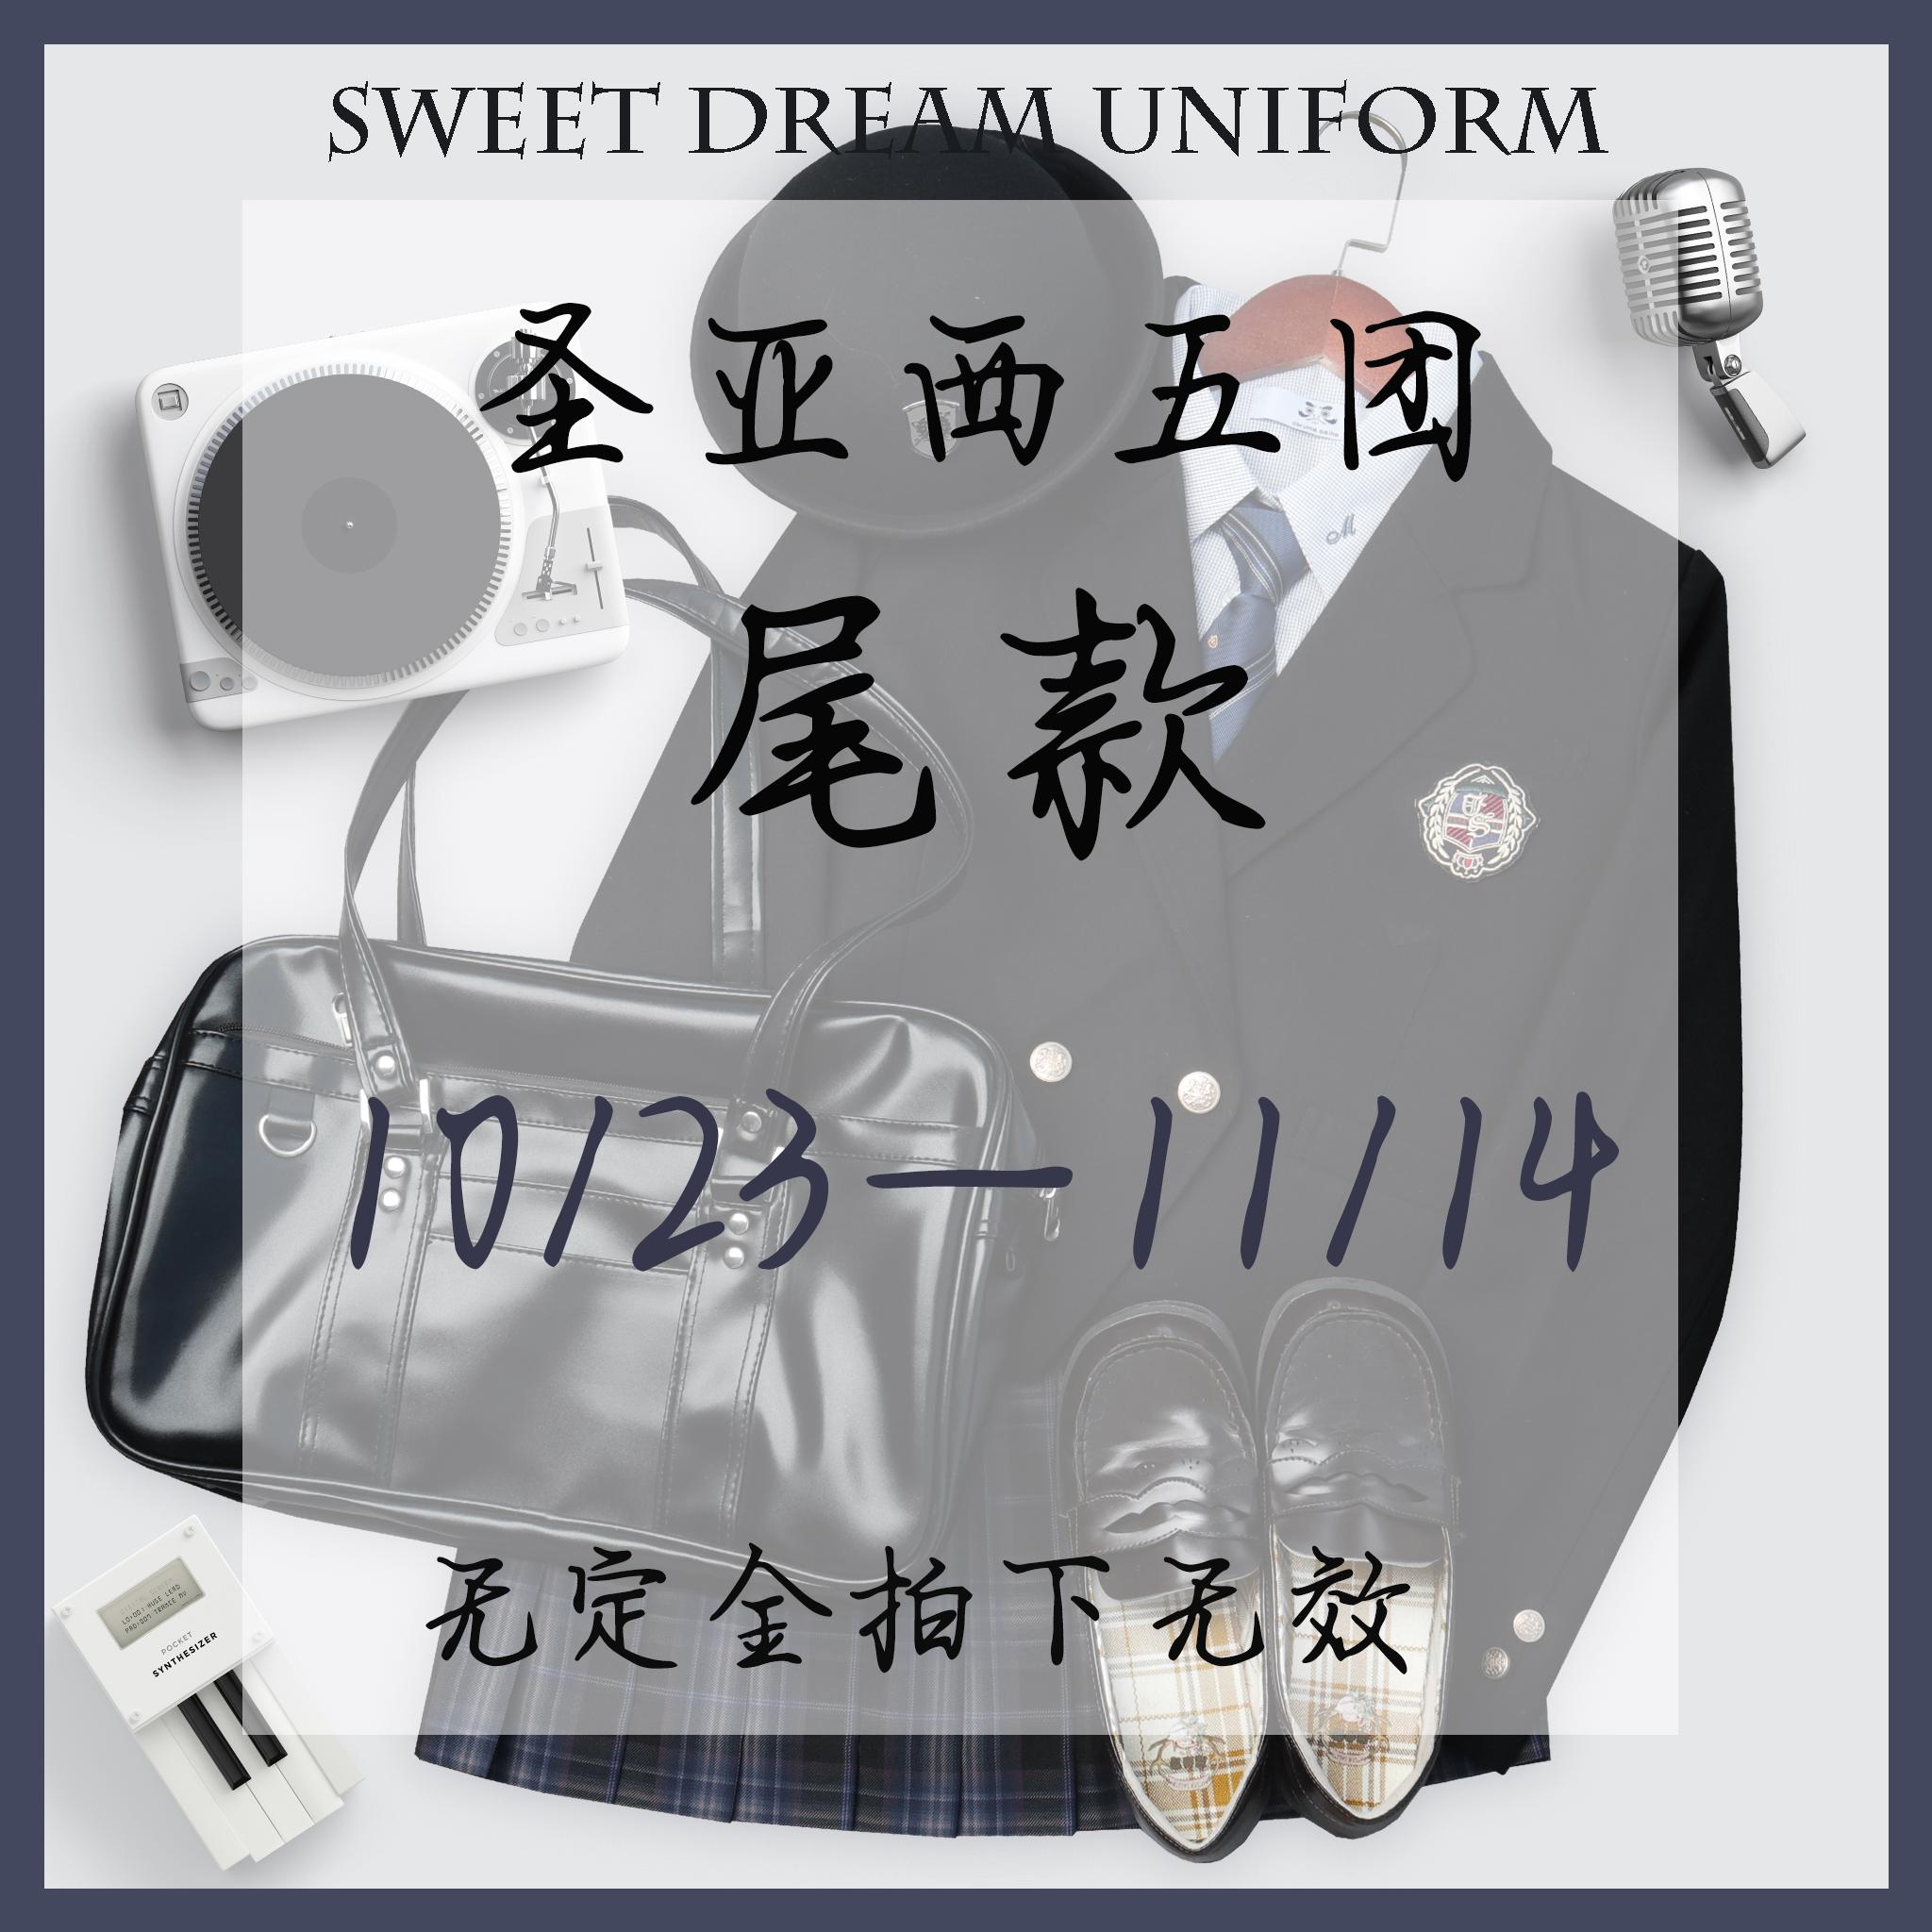 (Tail) St. Assy 5 group Western suit orthodox original Sweetdream Sweet Dream jk